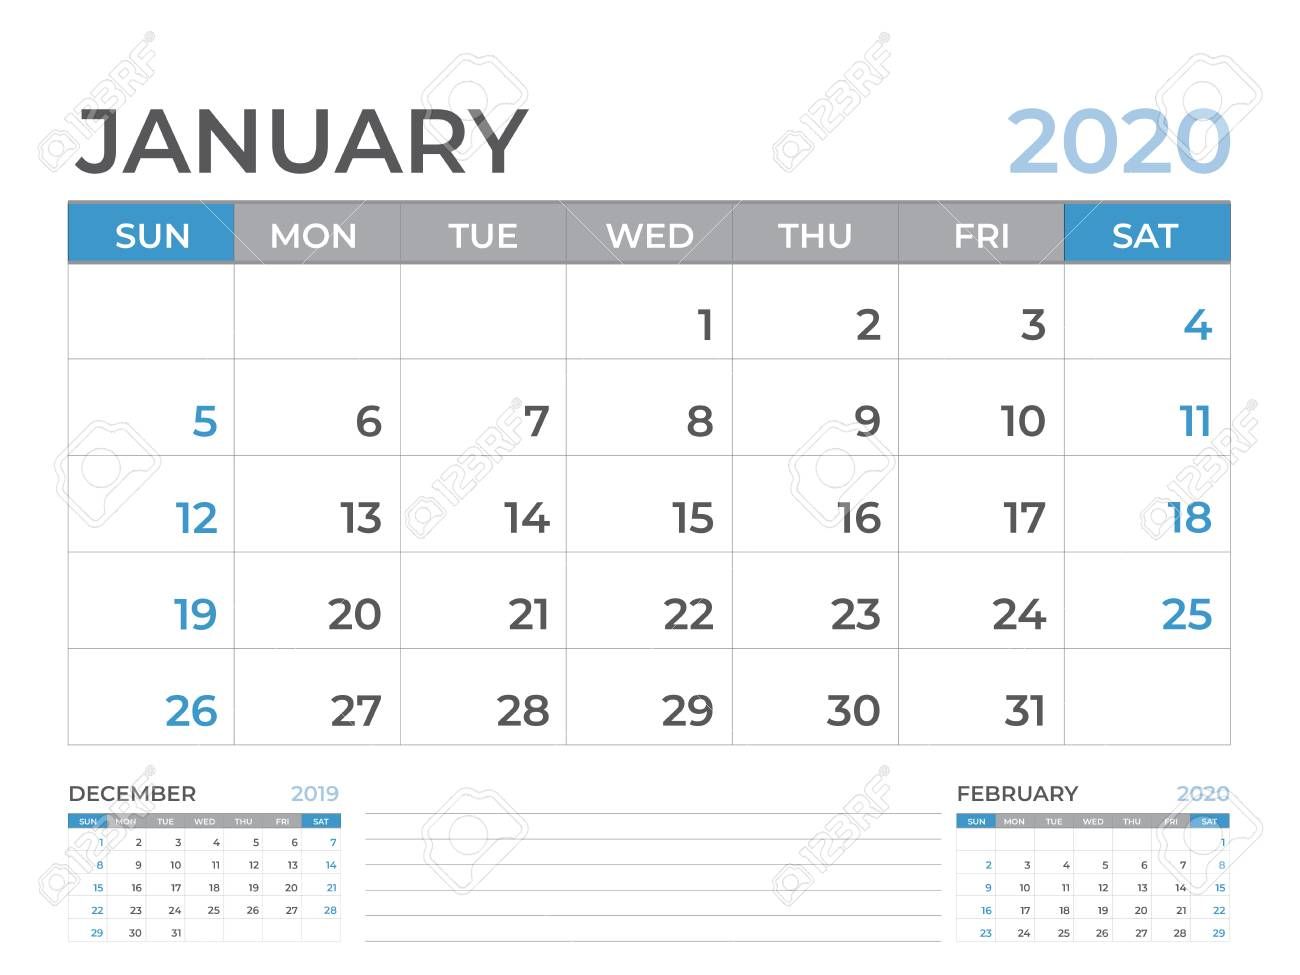 January 2020 Calendar Template.January 2020 Calendar Template Desk Calendar Layout Size 8